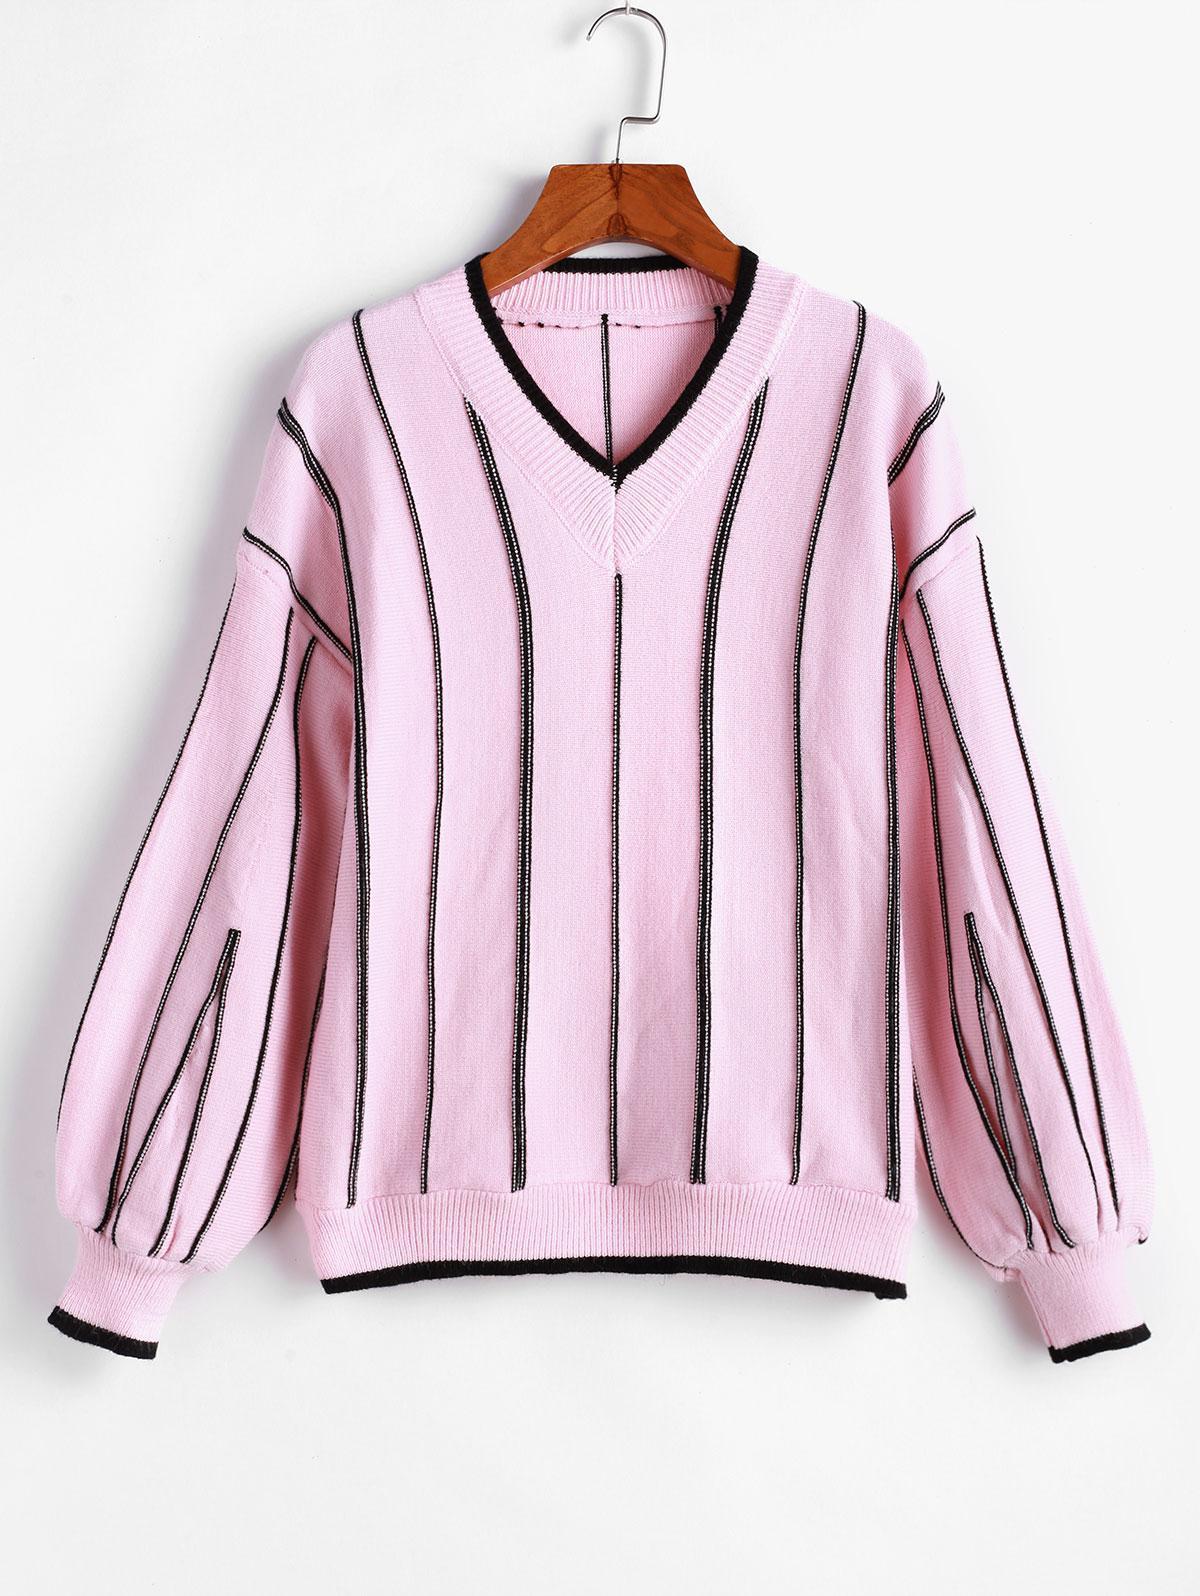 Pullover Textured Stripes V Neck Sweater